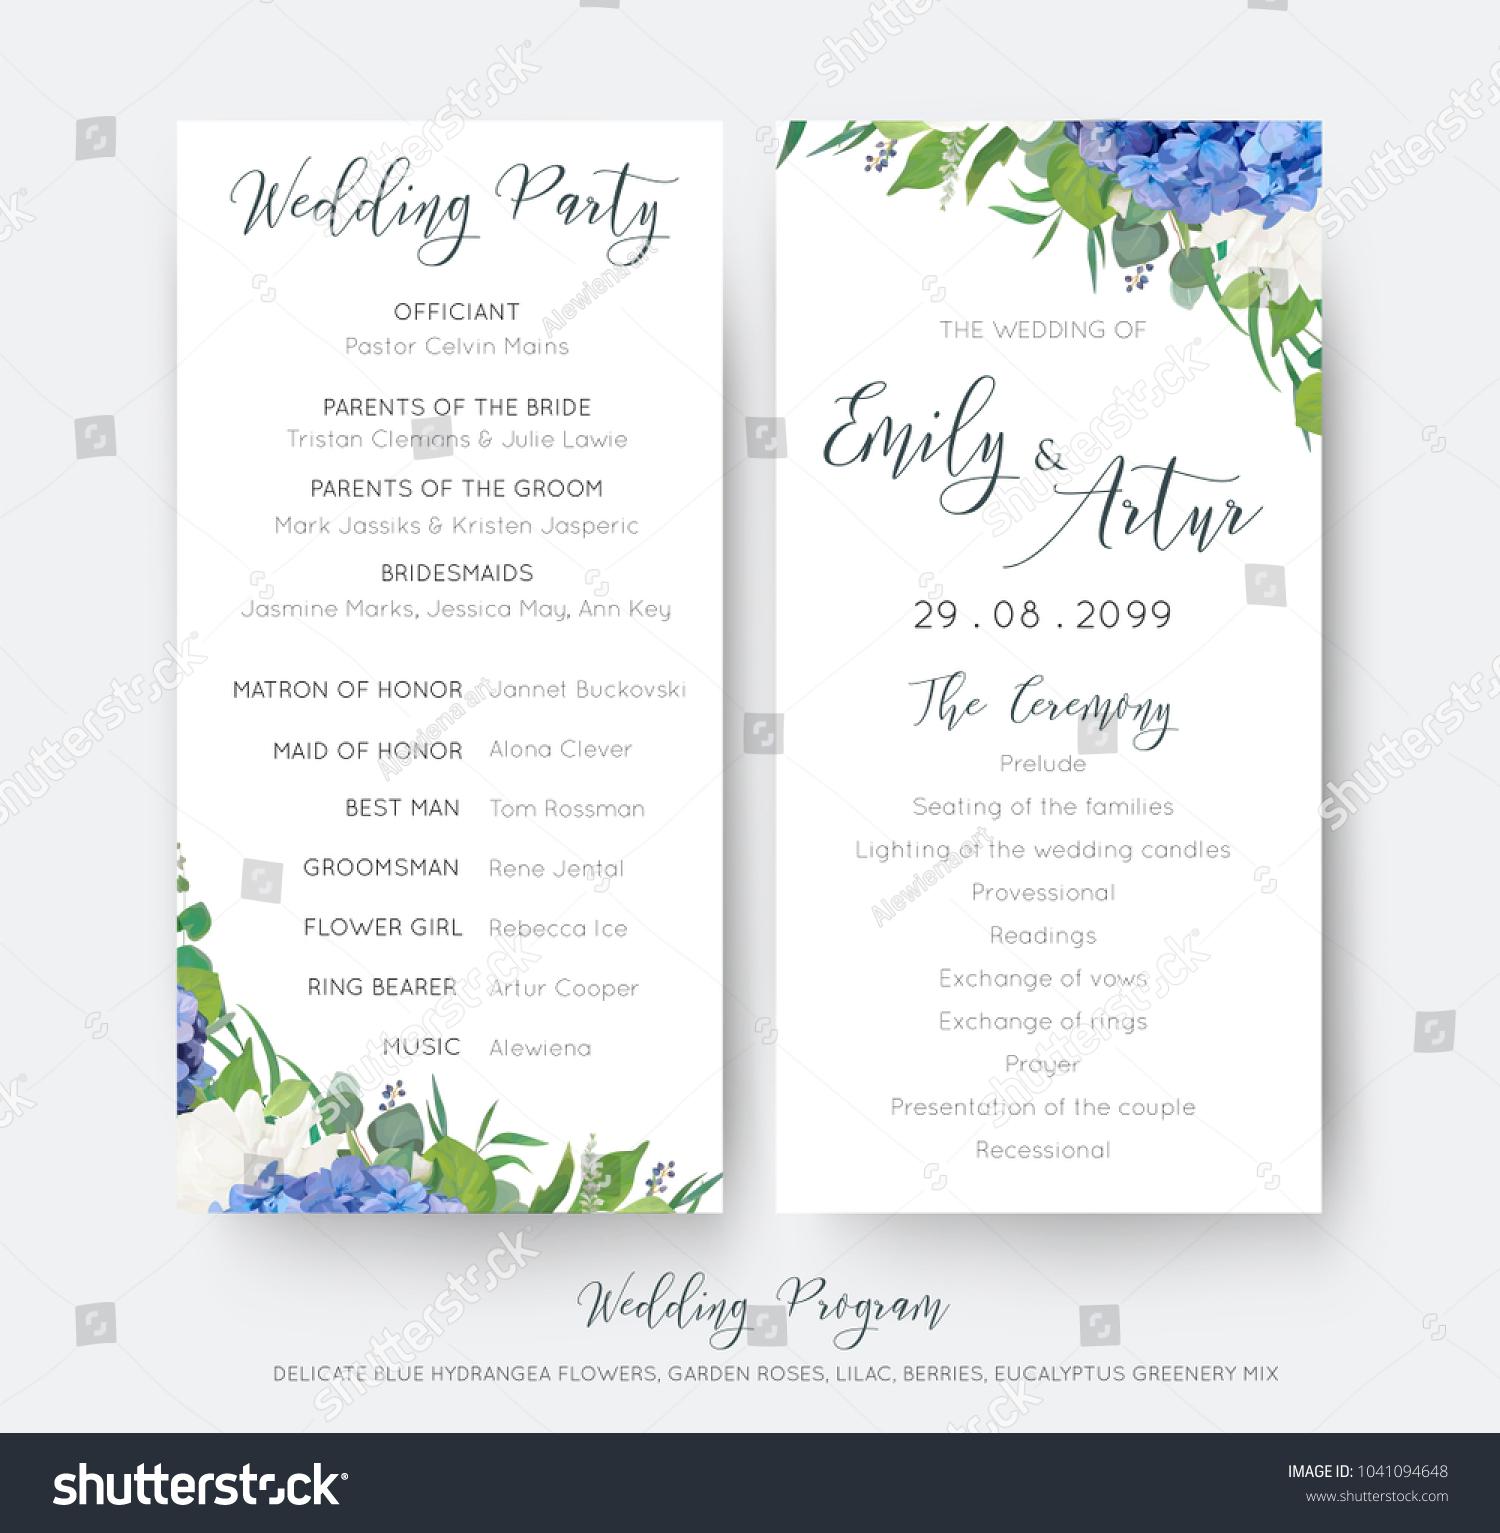 Wedding Floral Wedding Party Ceremony Program Stock Vector Royalty